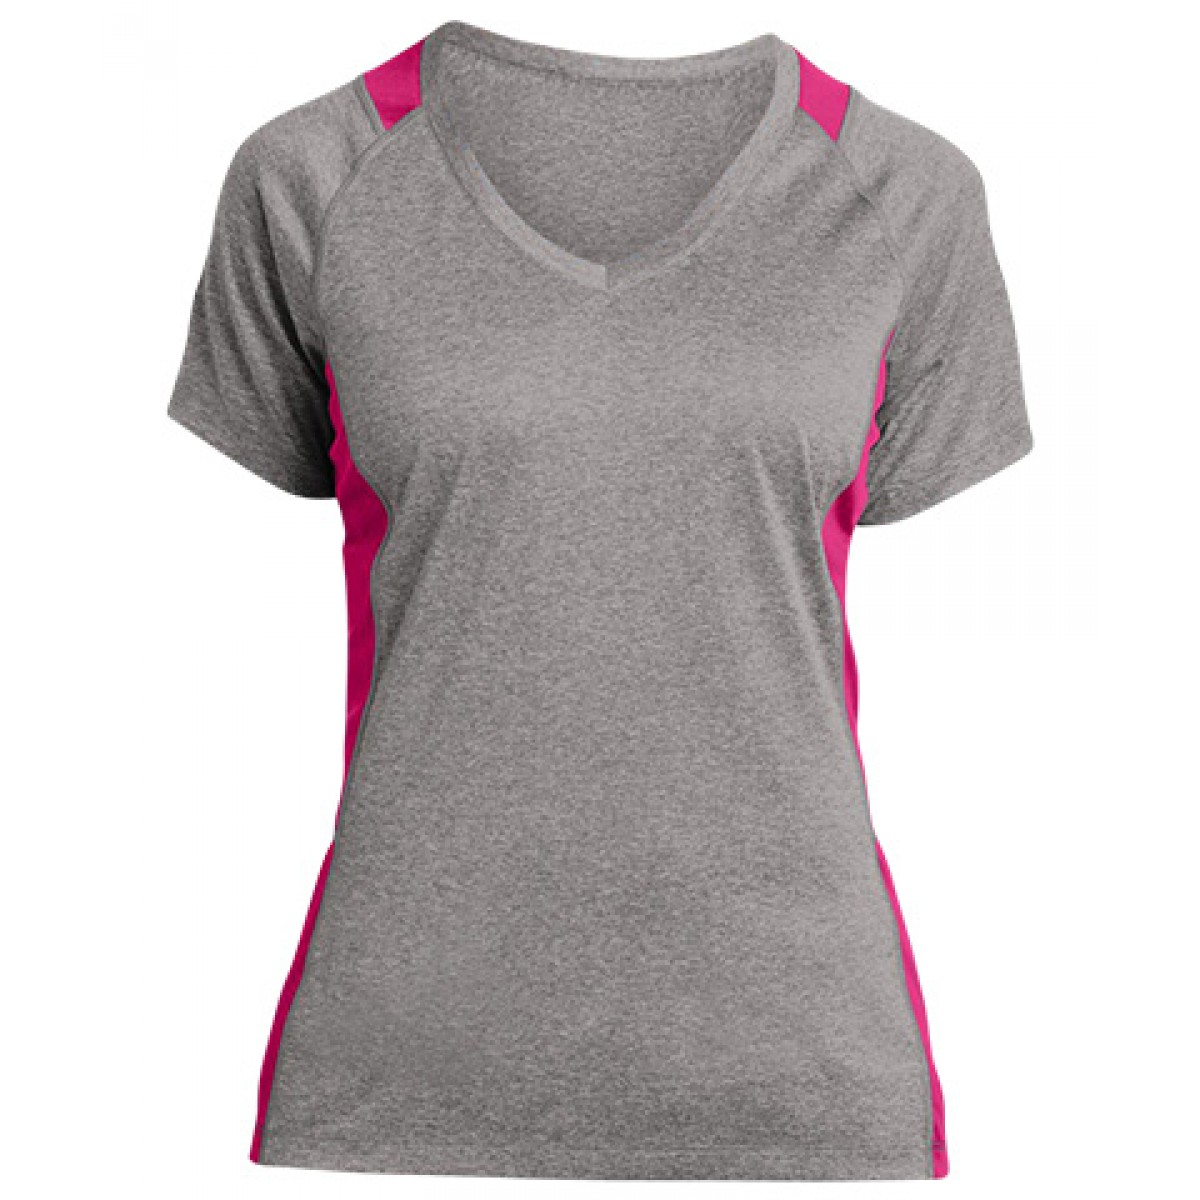 Ladies' Heather Colorblock Contender V-Neck Tee-Heather/Pink-M